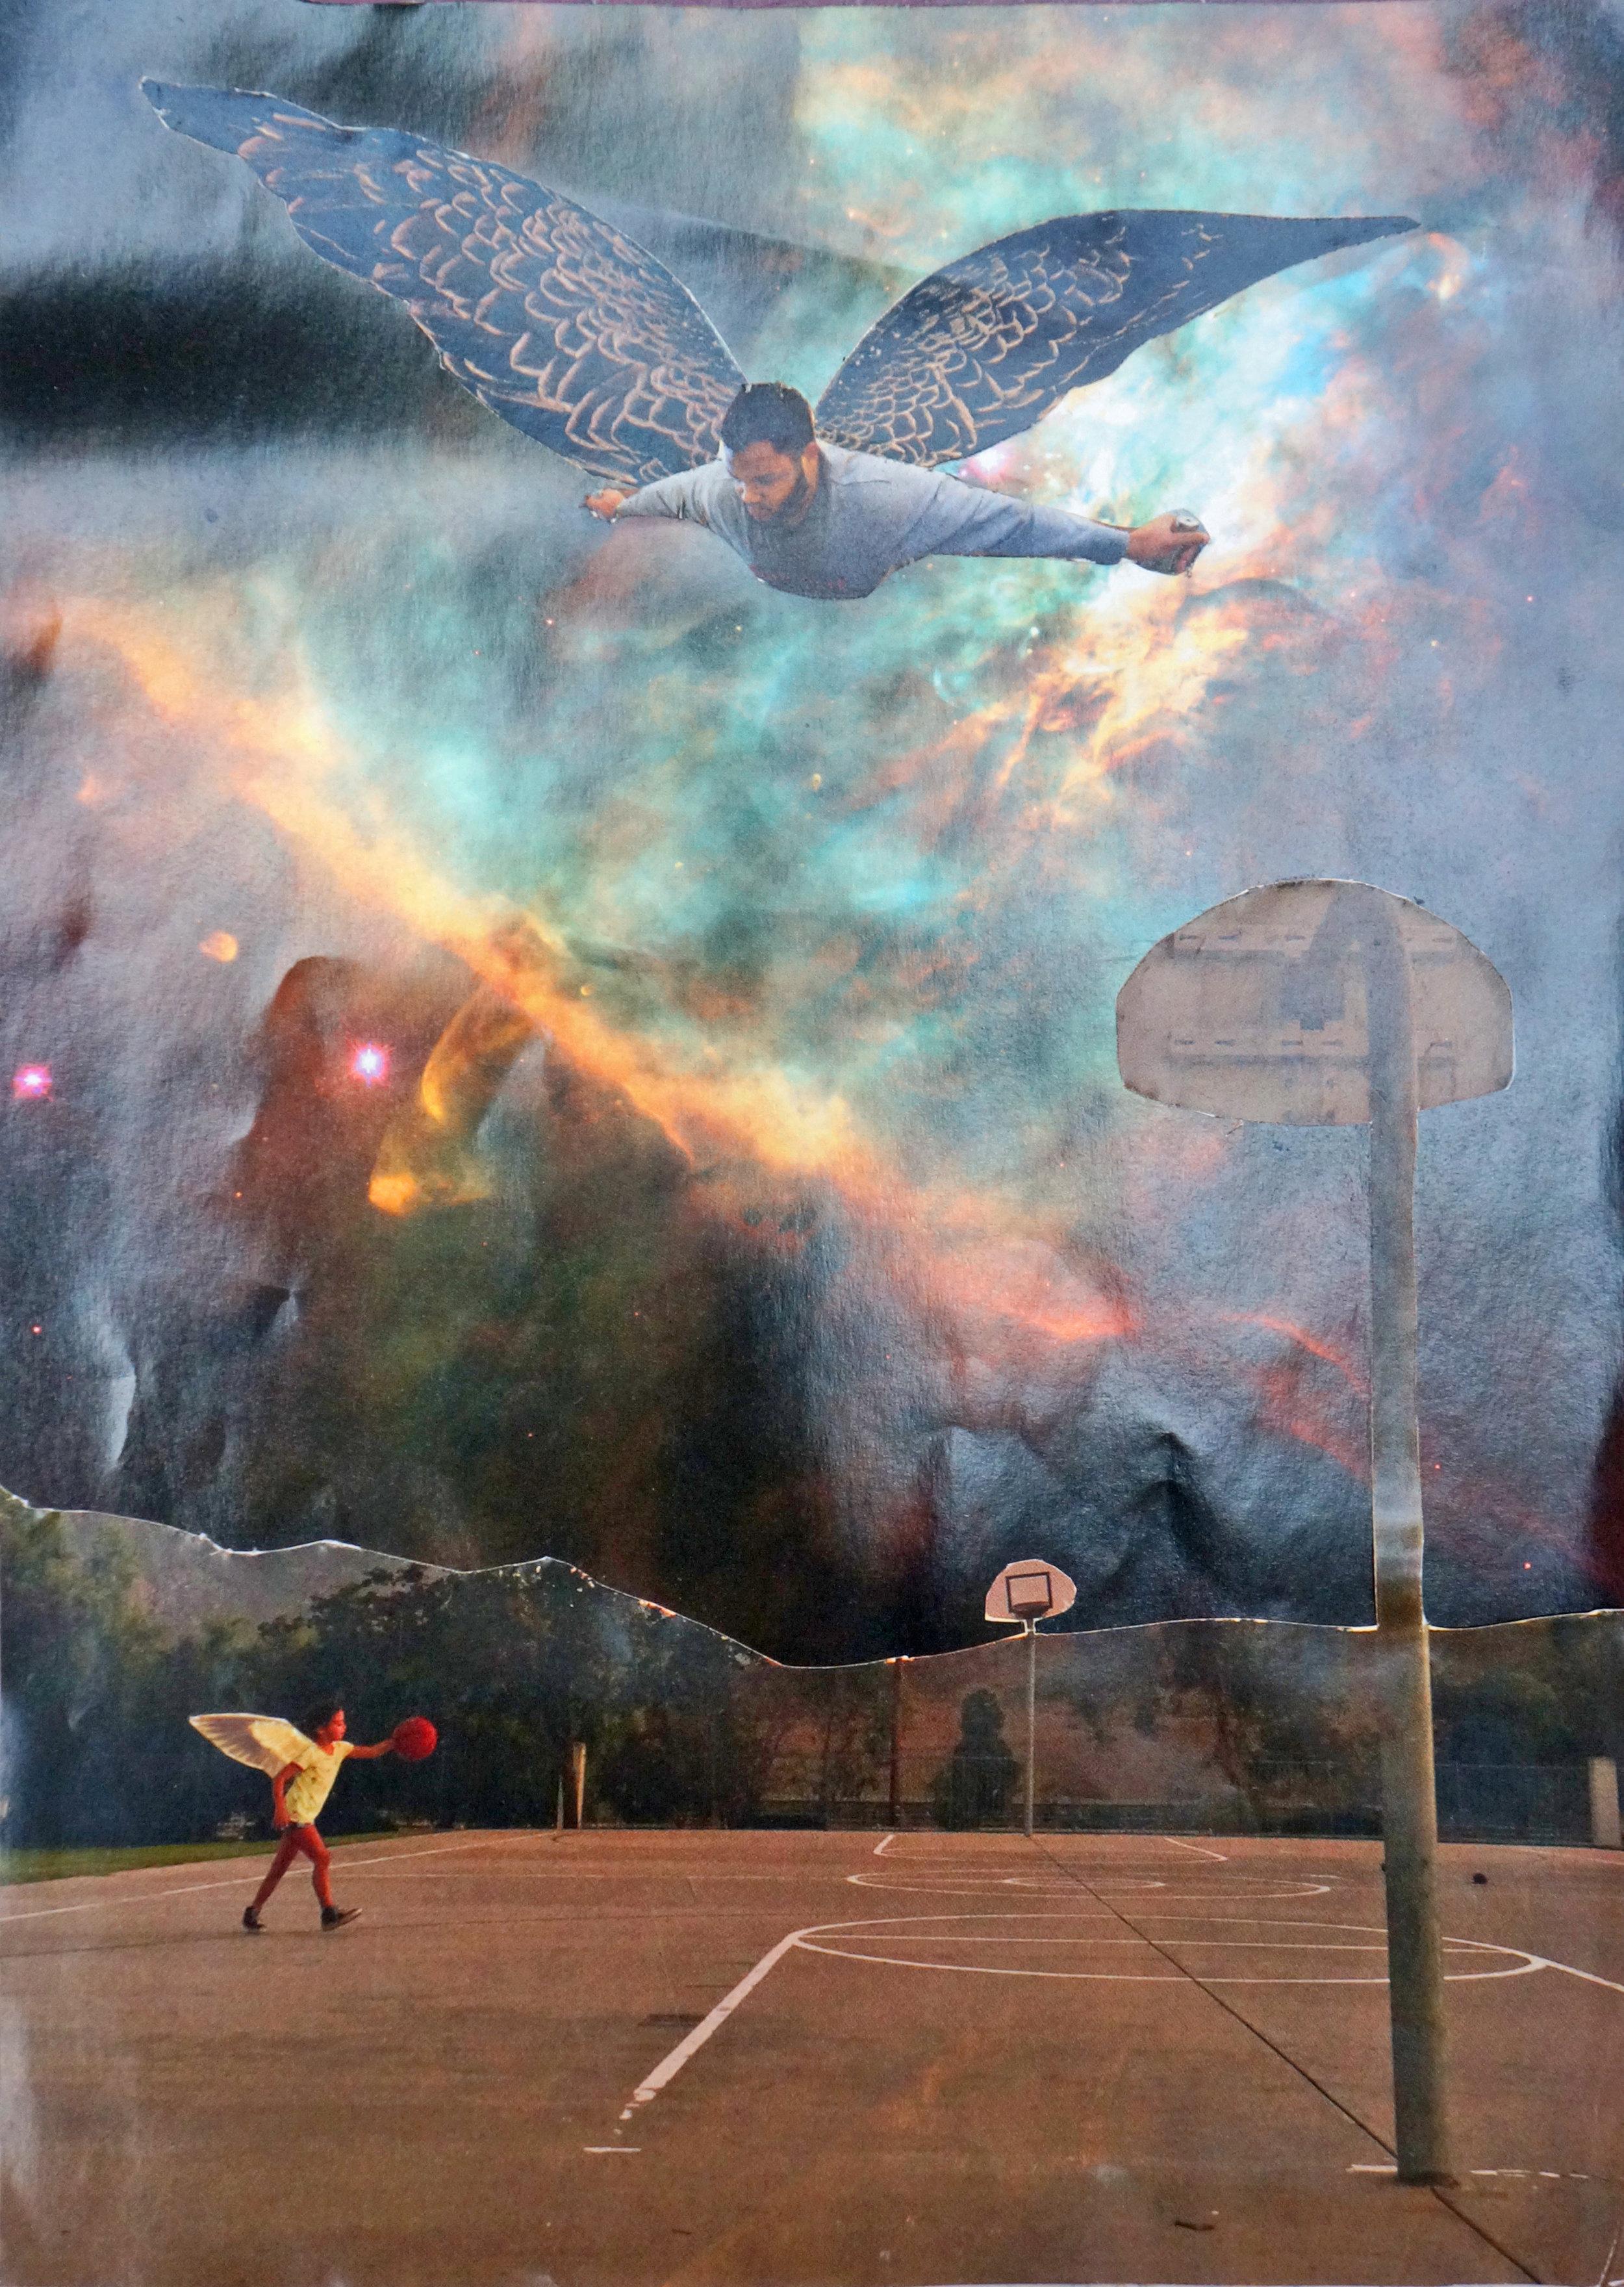 1 angel over b'ball court (2).jpg